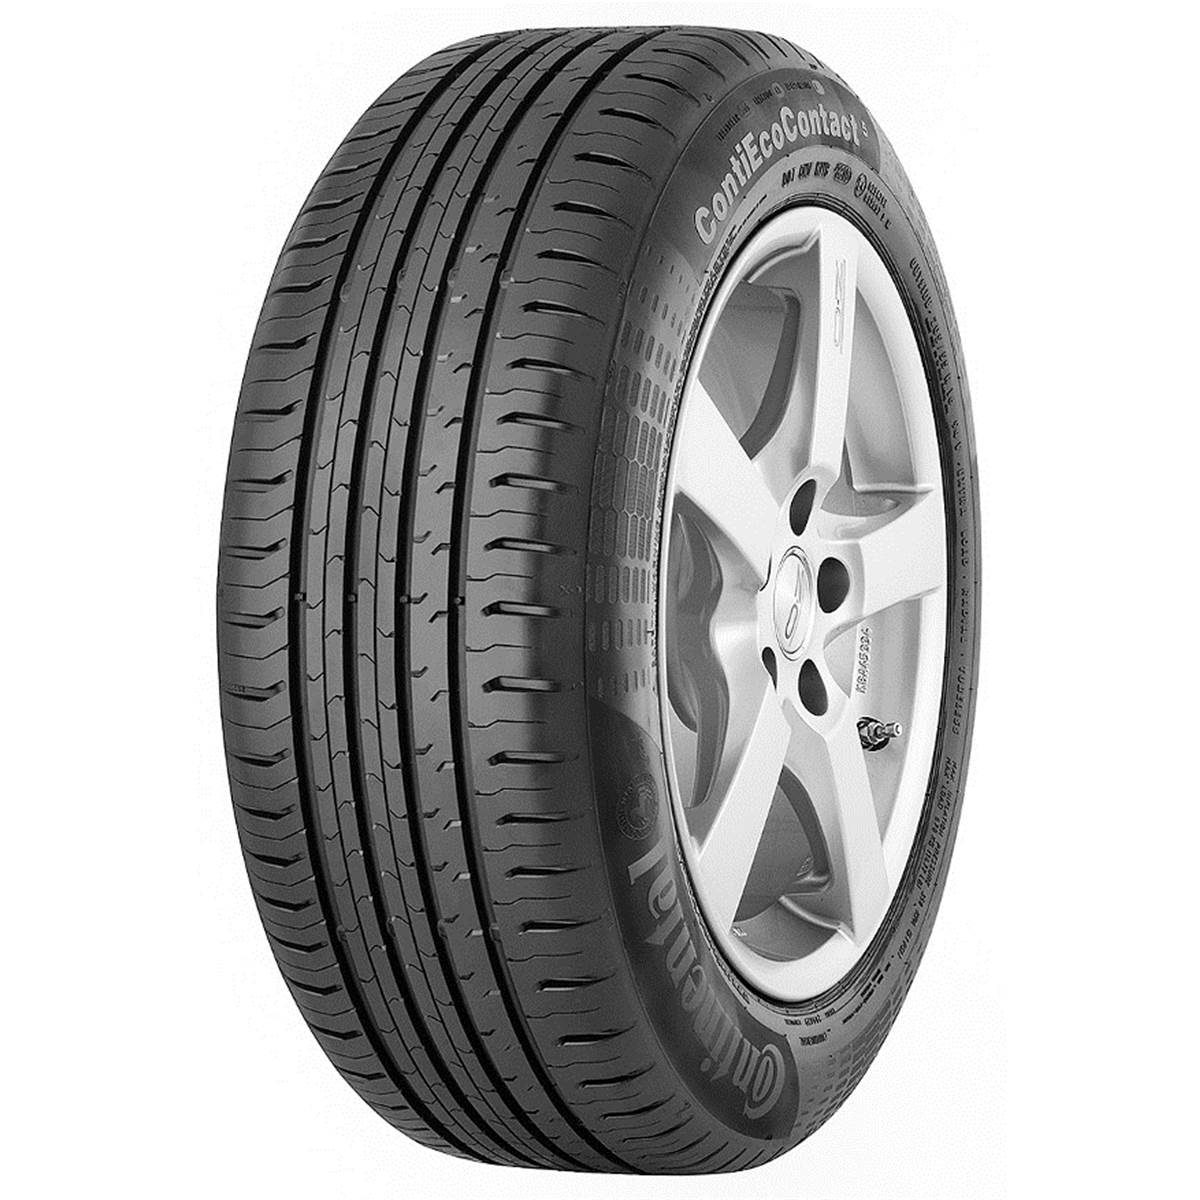 pneu continental 195 65 r15 91h